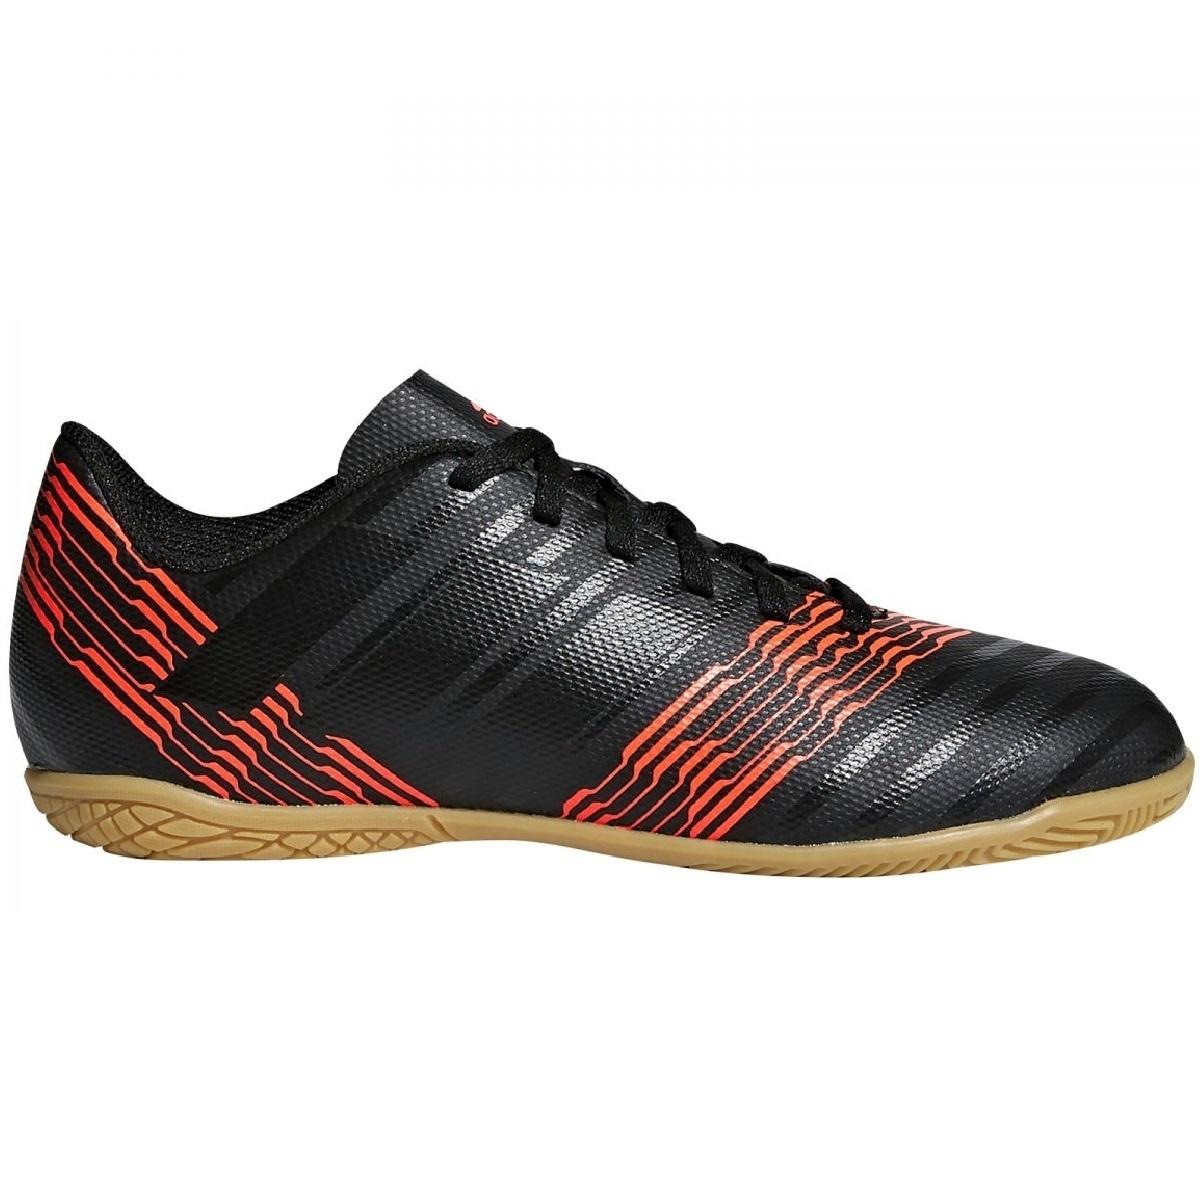 adidas Nemeziz Tango 17.4 Indoor